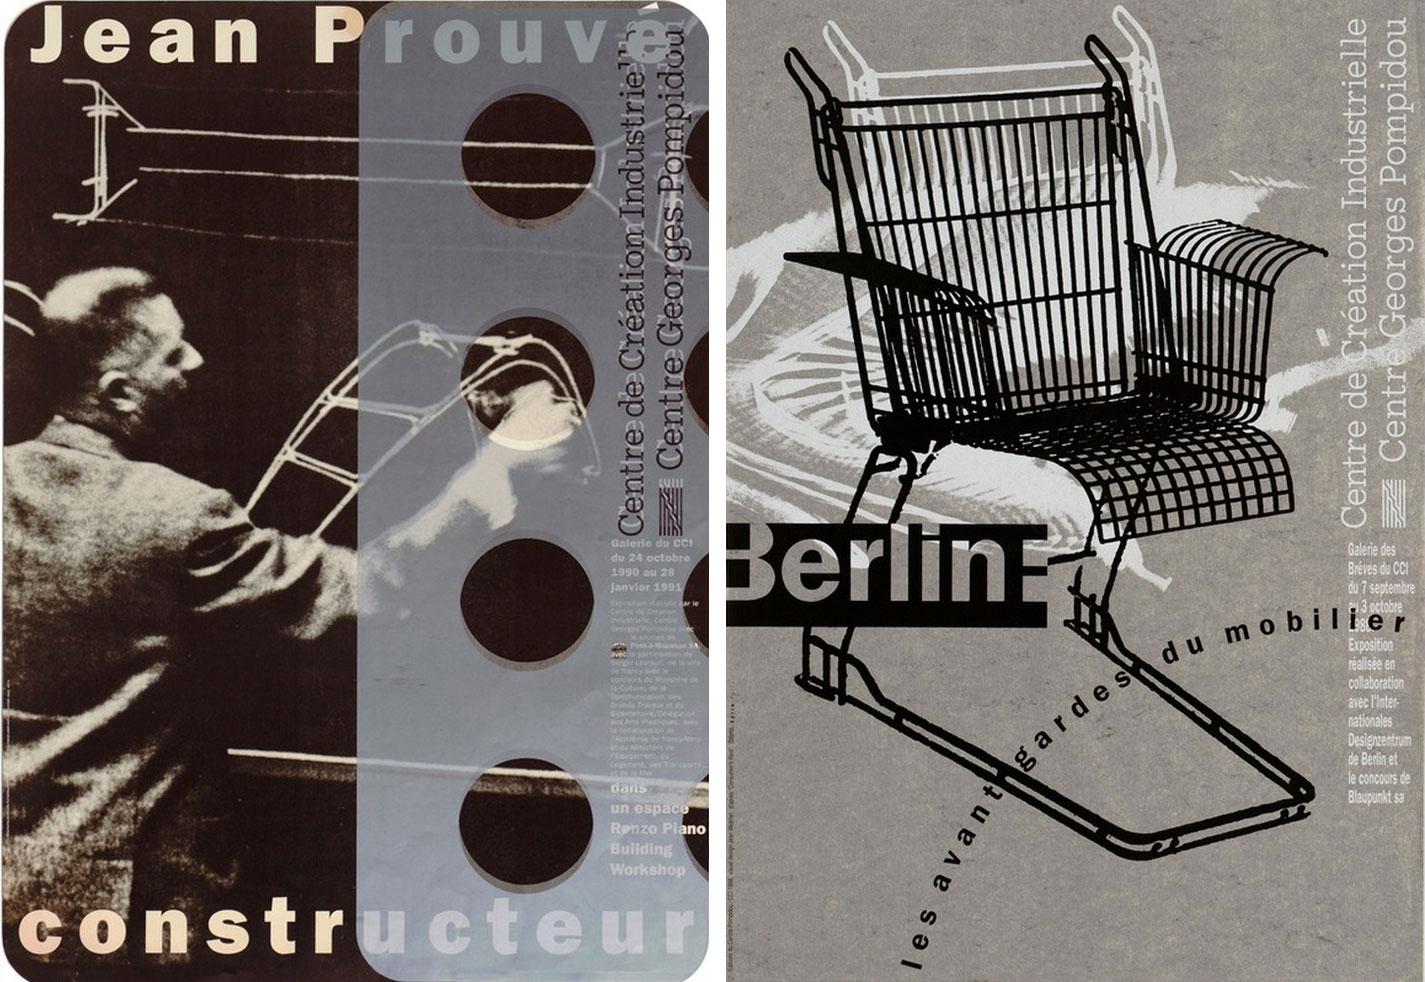 jean-widmer-affiche-centre-pompidou-prouve-berlin